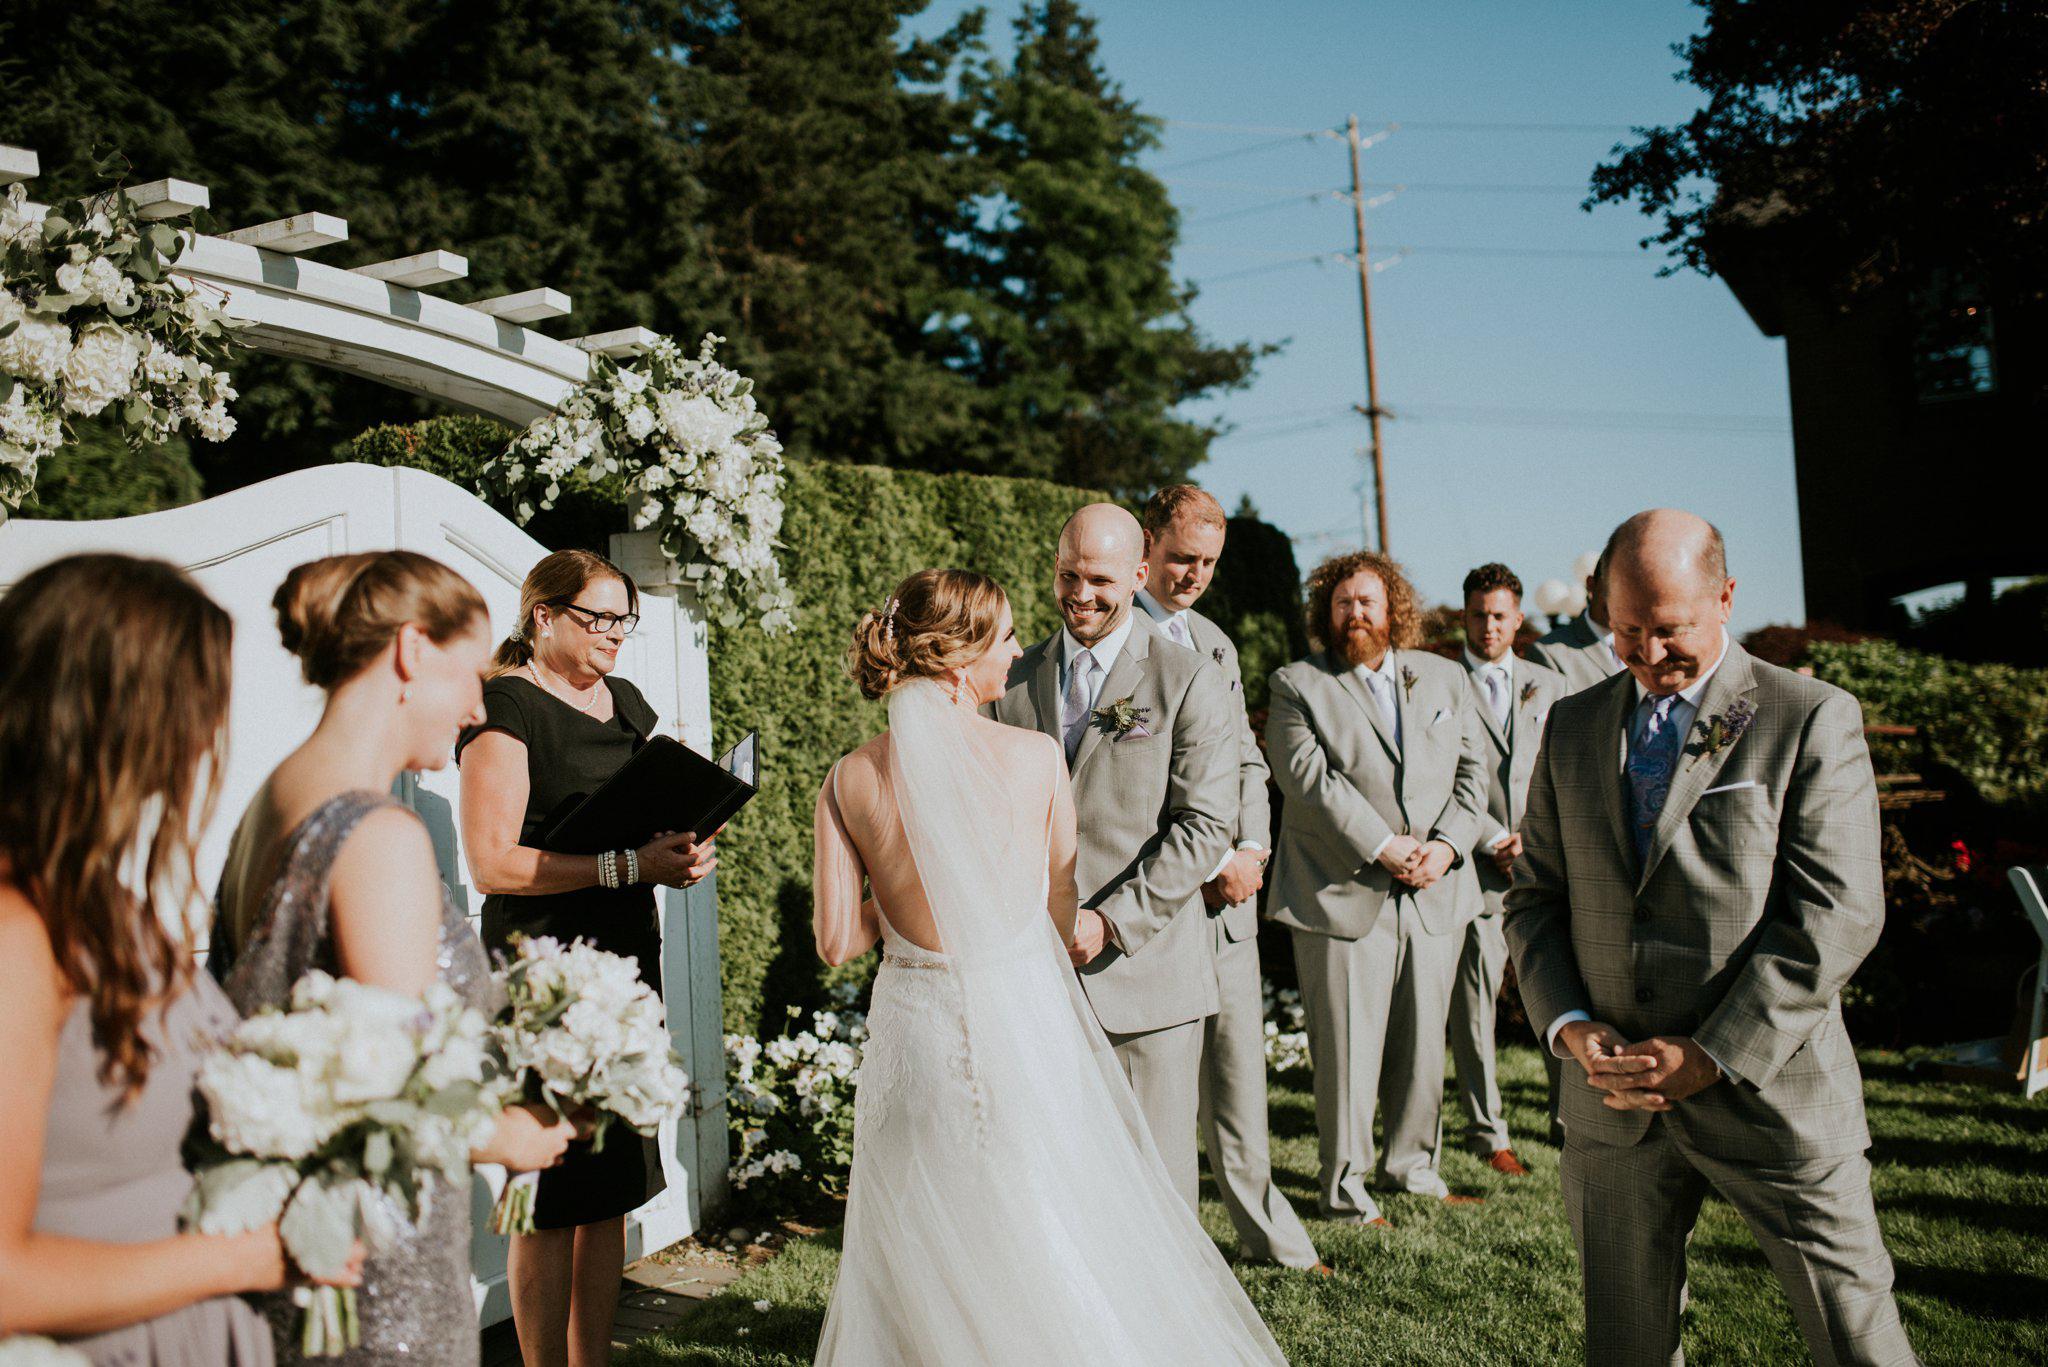 hollywood-school-house-wedding-seattle-photographer-caitlyn-nikula-73.jpg